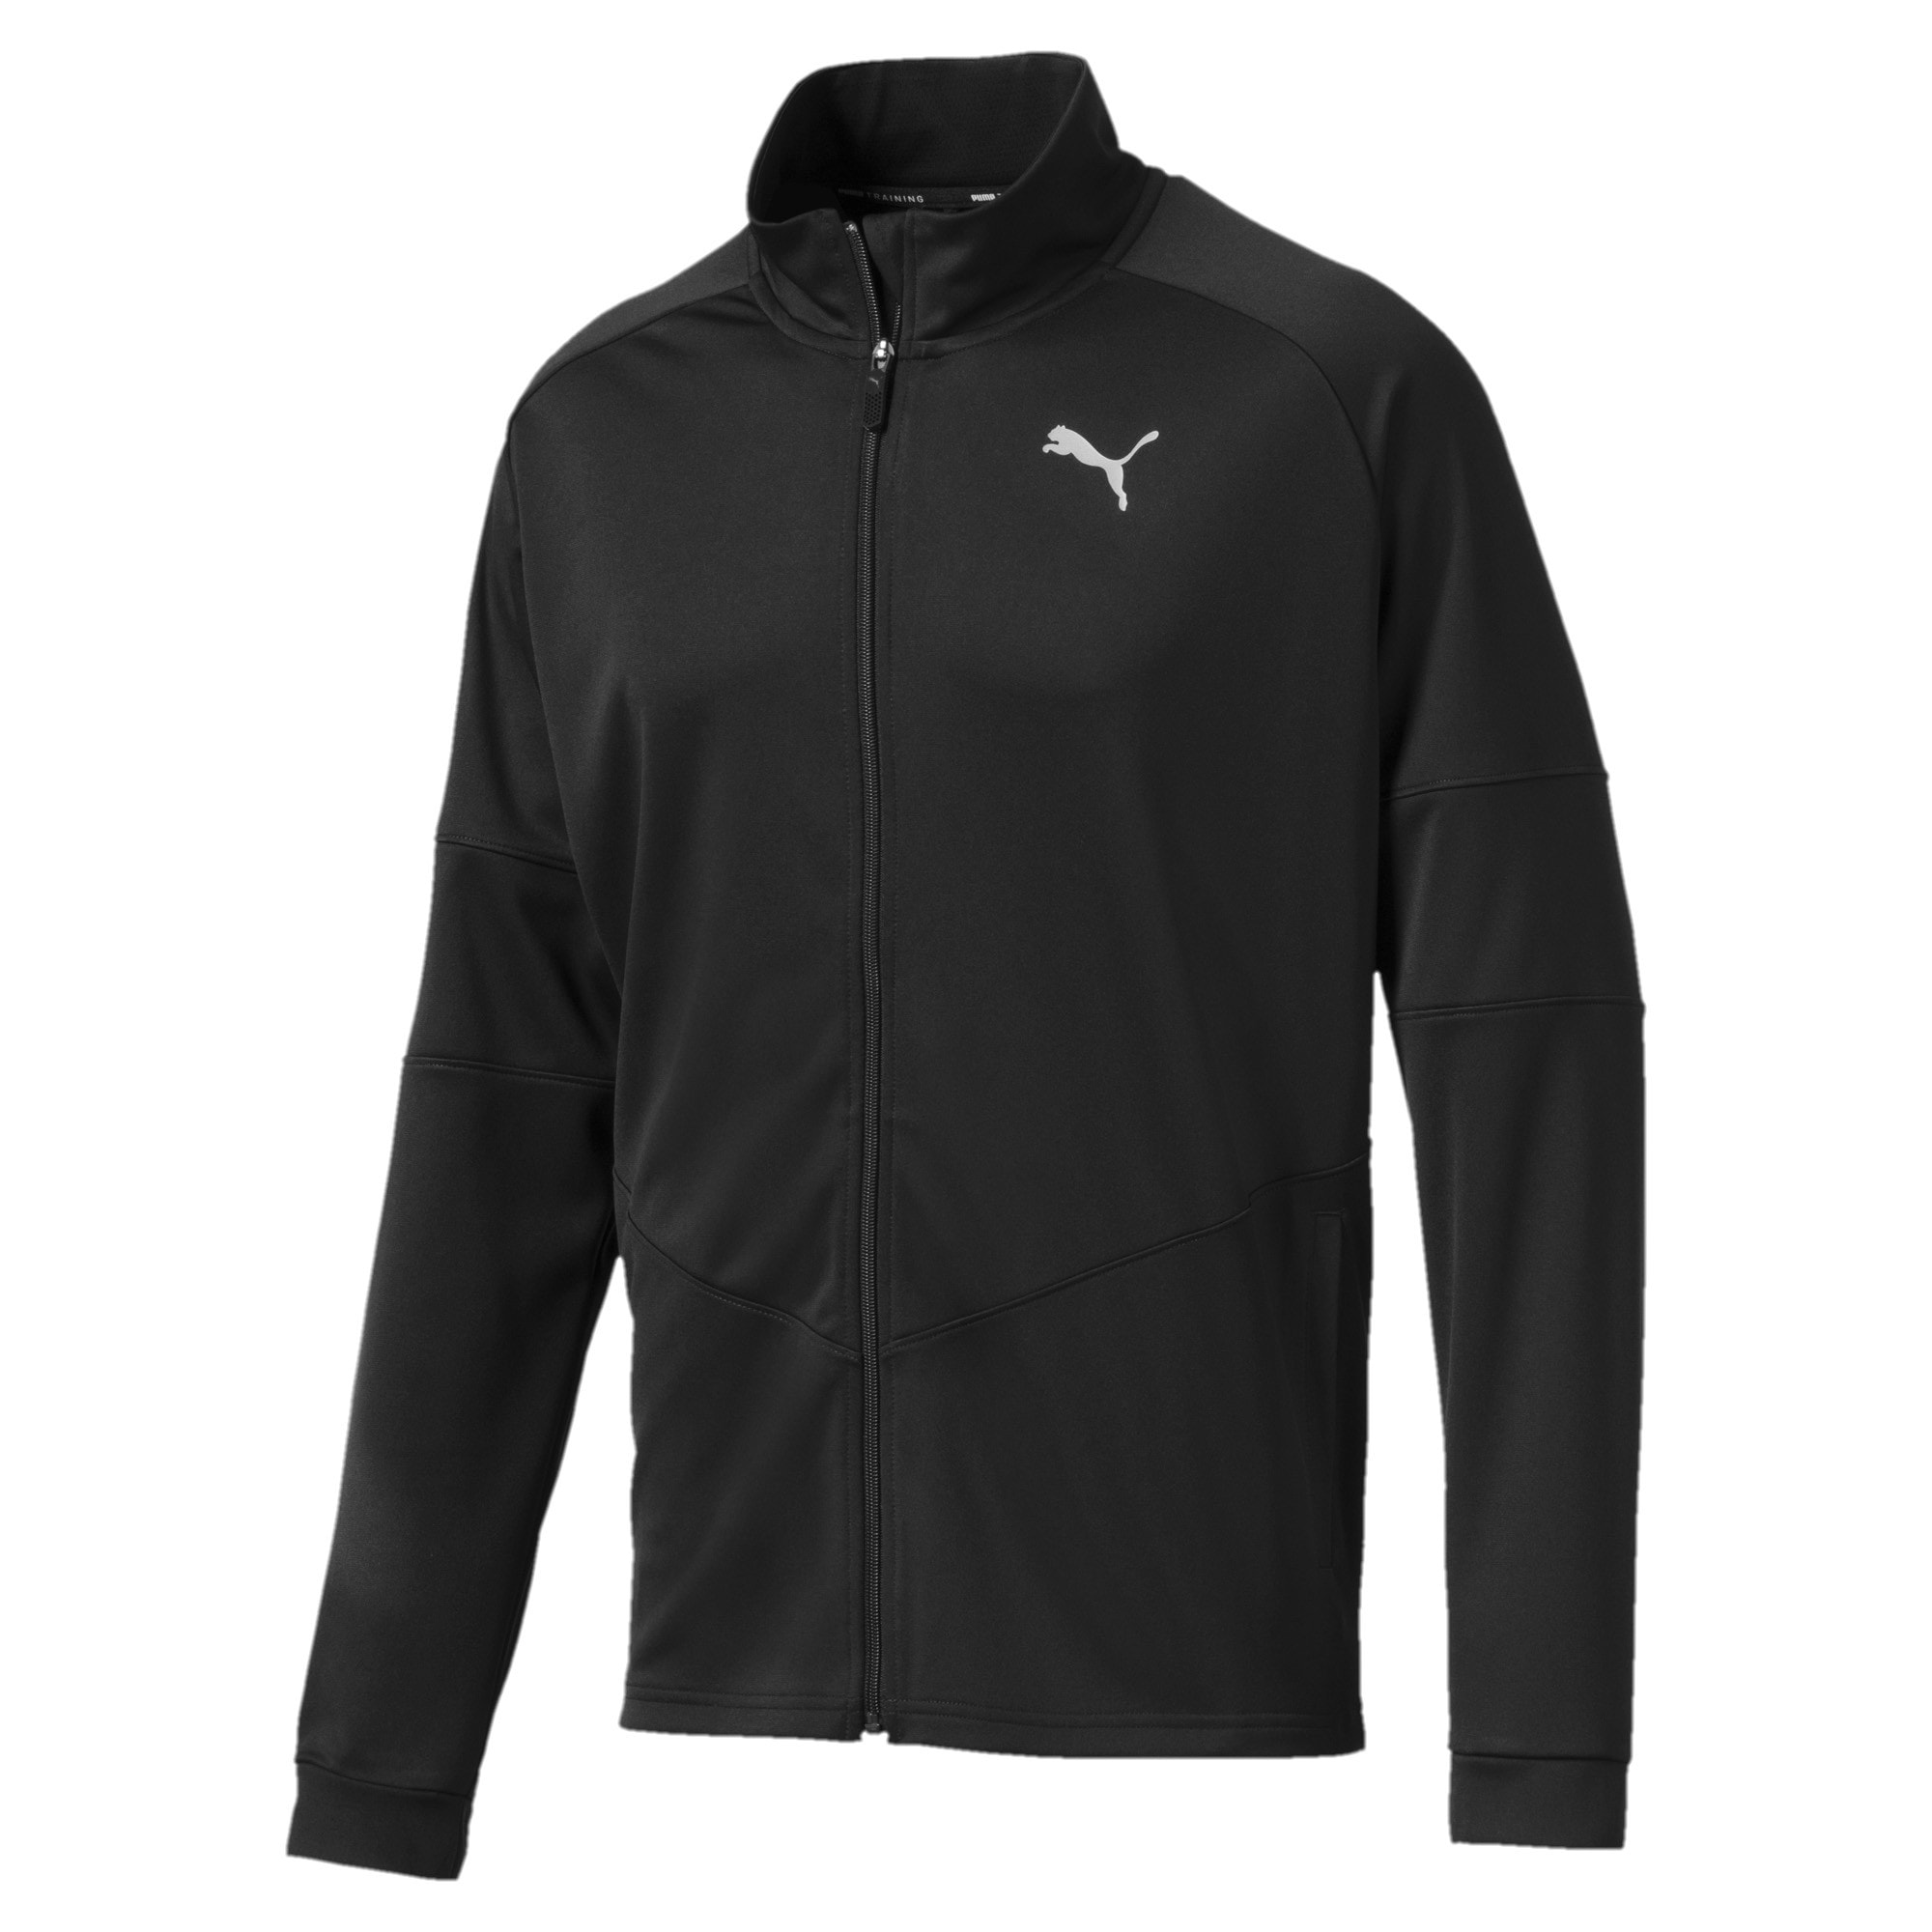 Thumbnail 1 of PUMA Blaster Men's Jacket, Puma Black, medium